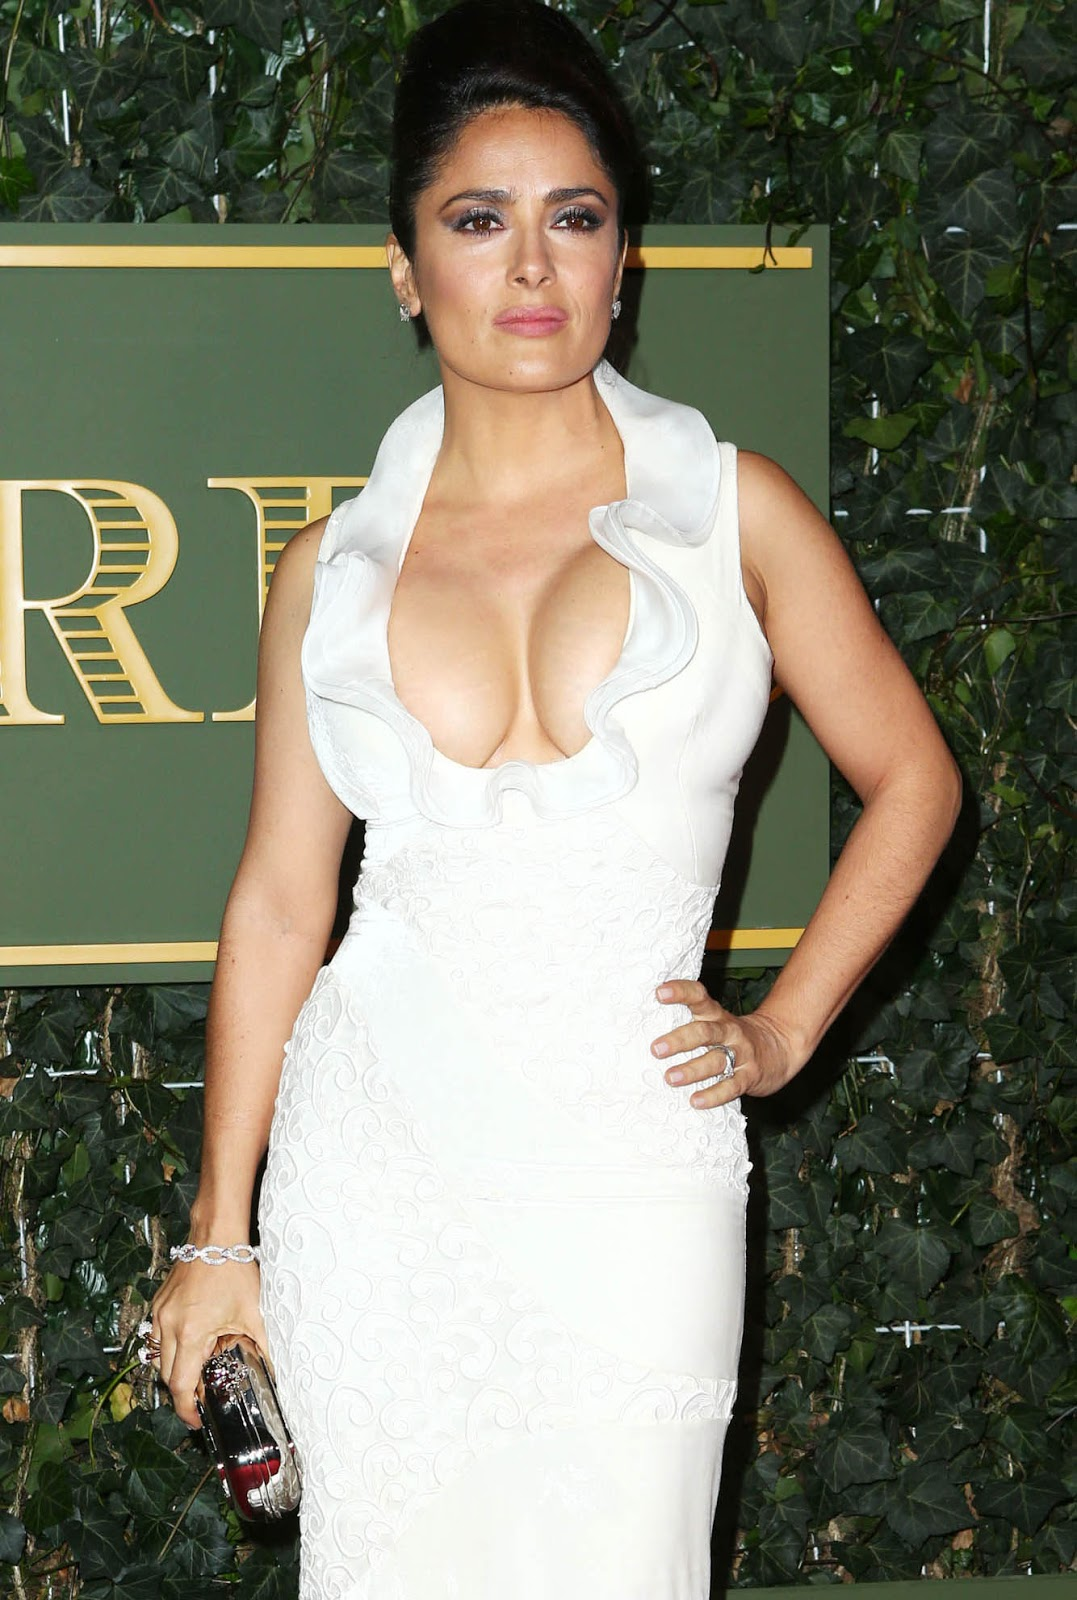 Cleavage Allie Mason naked (64 photos), Tits, Hot, Boobs, braless 2020